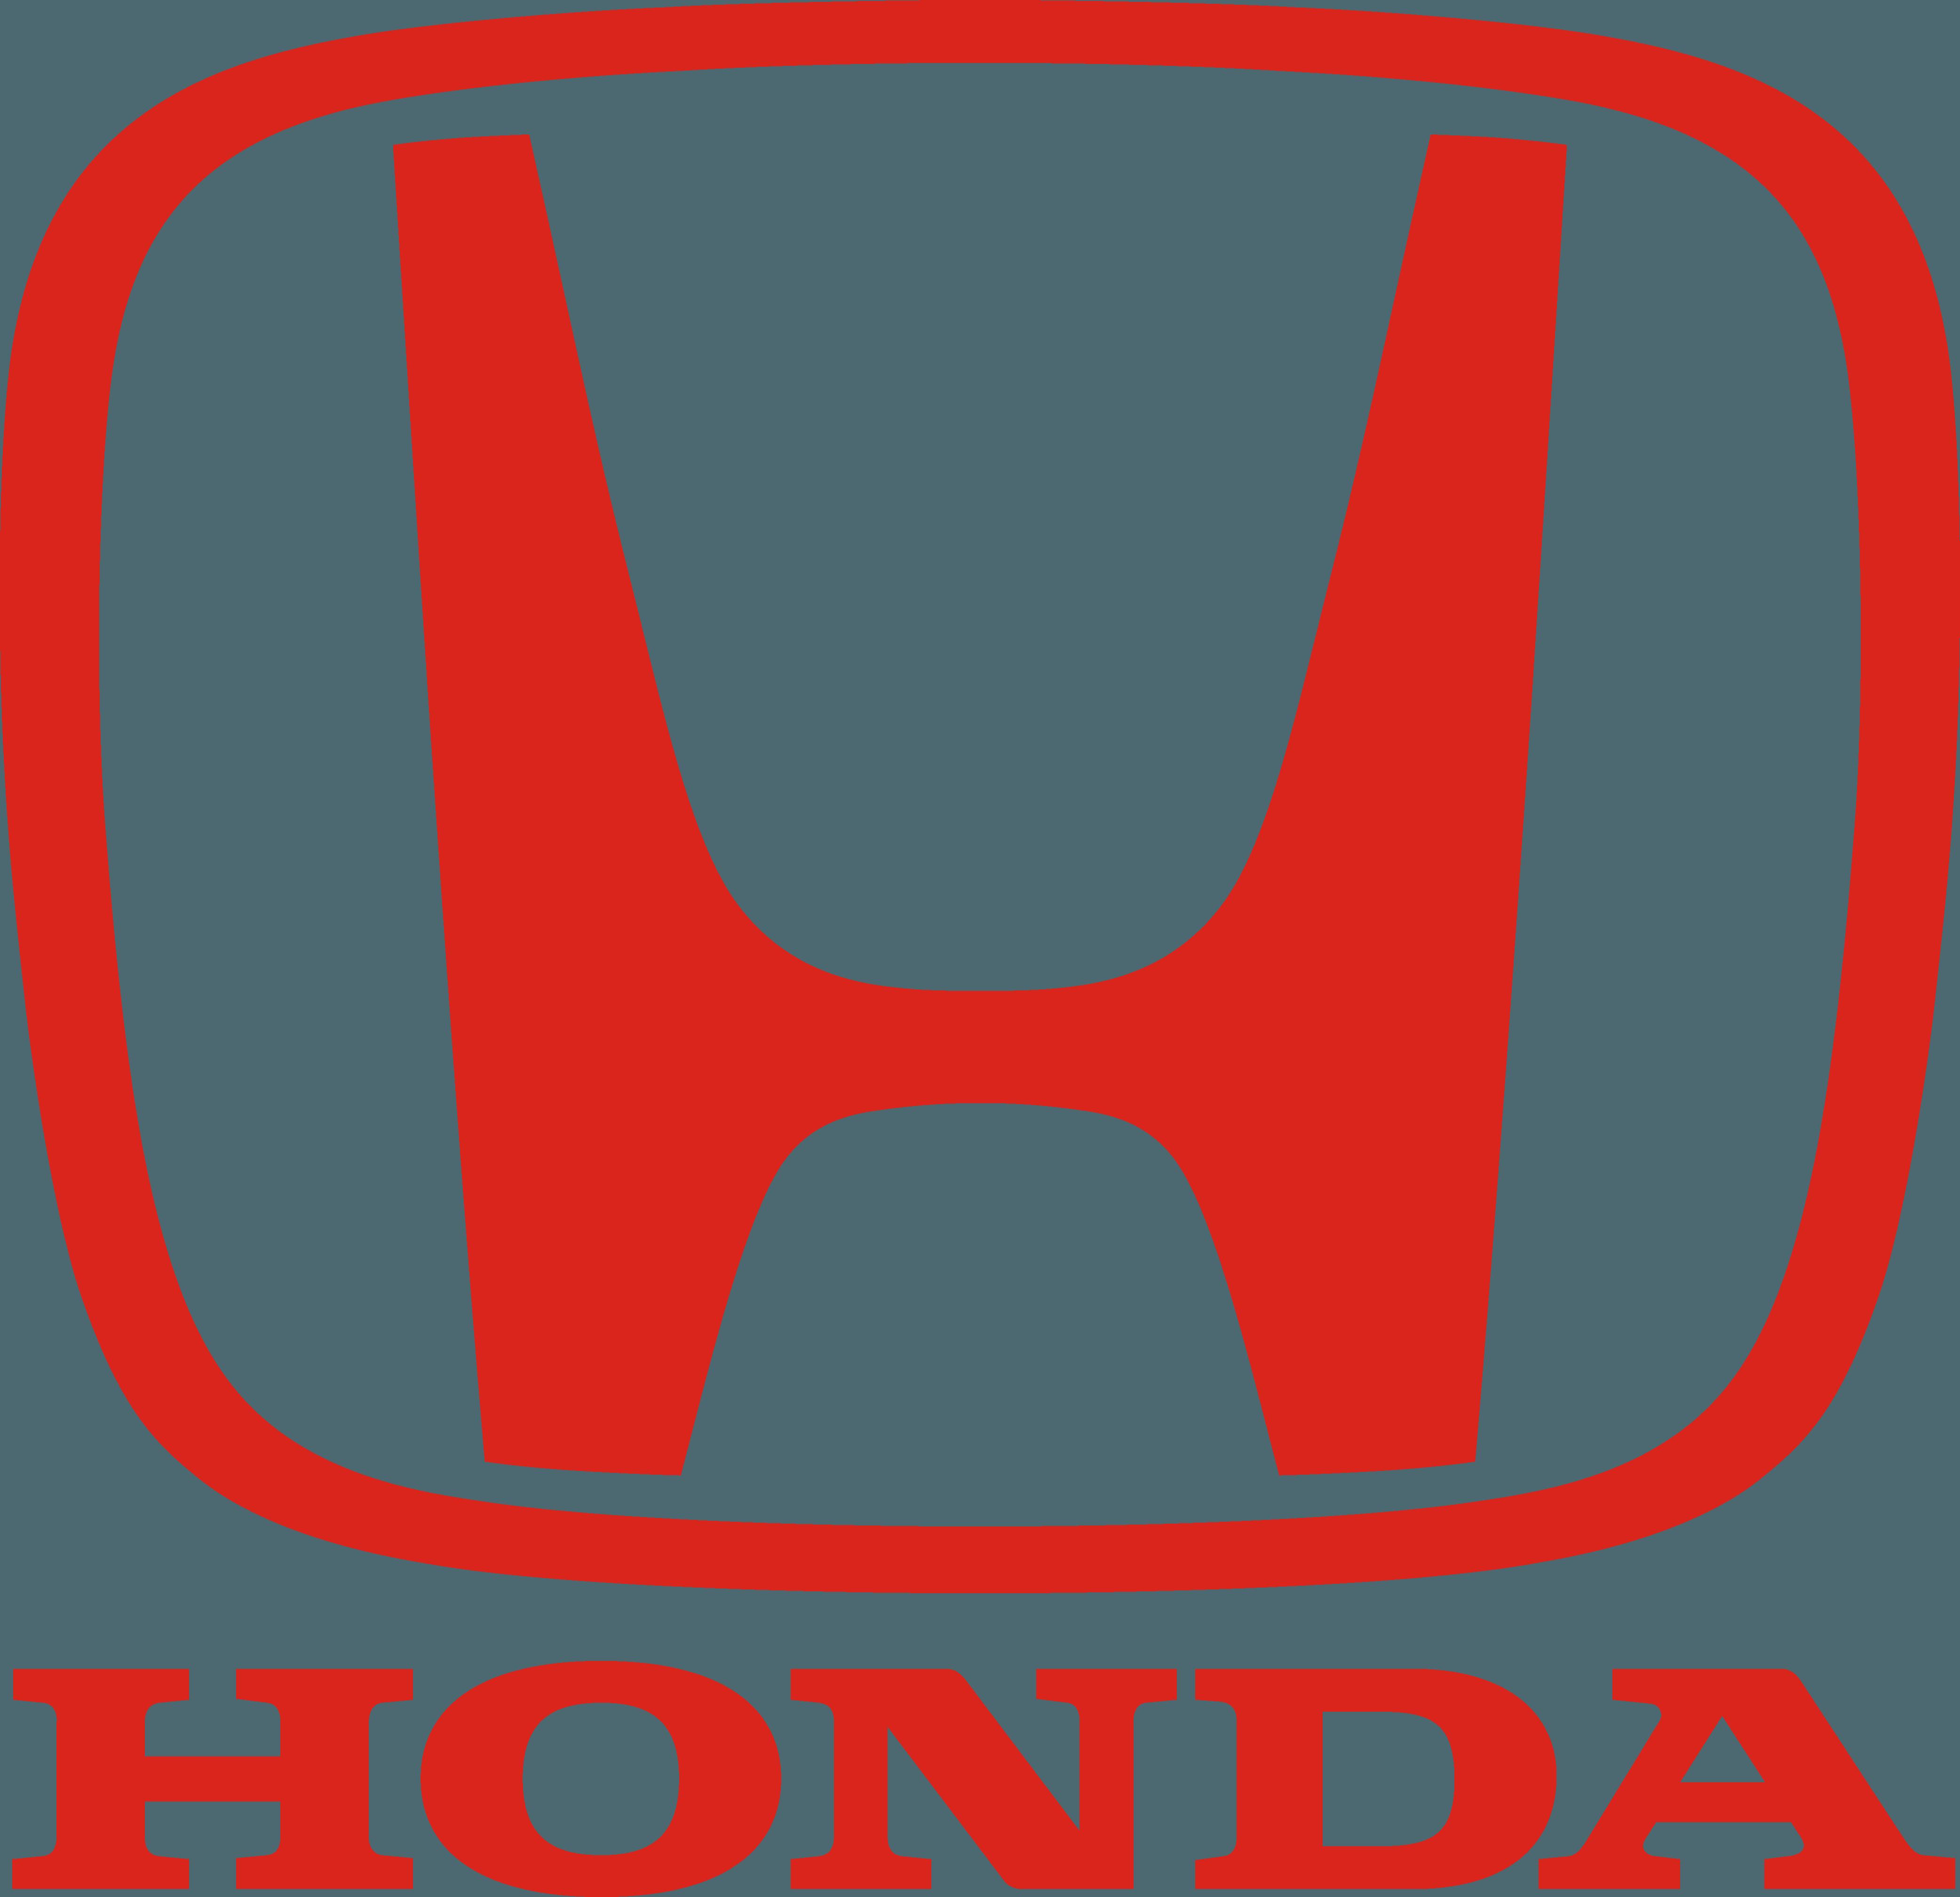 honda logo vector eps free download logo icons clipart rh freelogovectors net honda racing logo vector honda racing logo vector